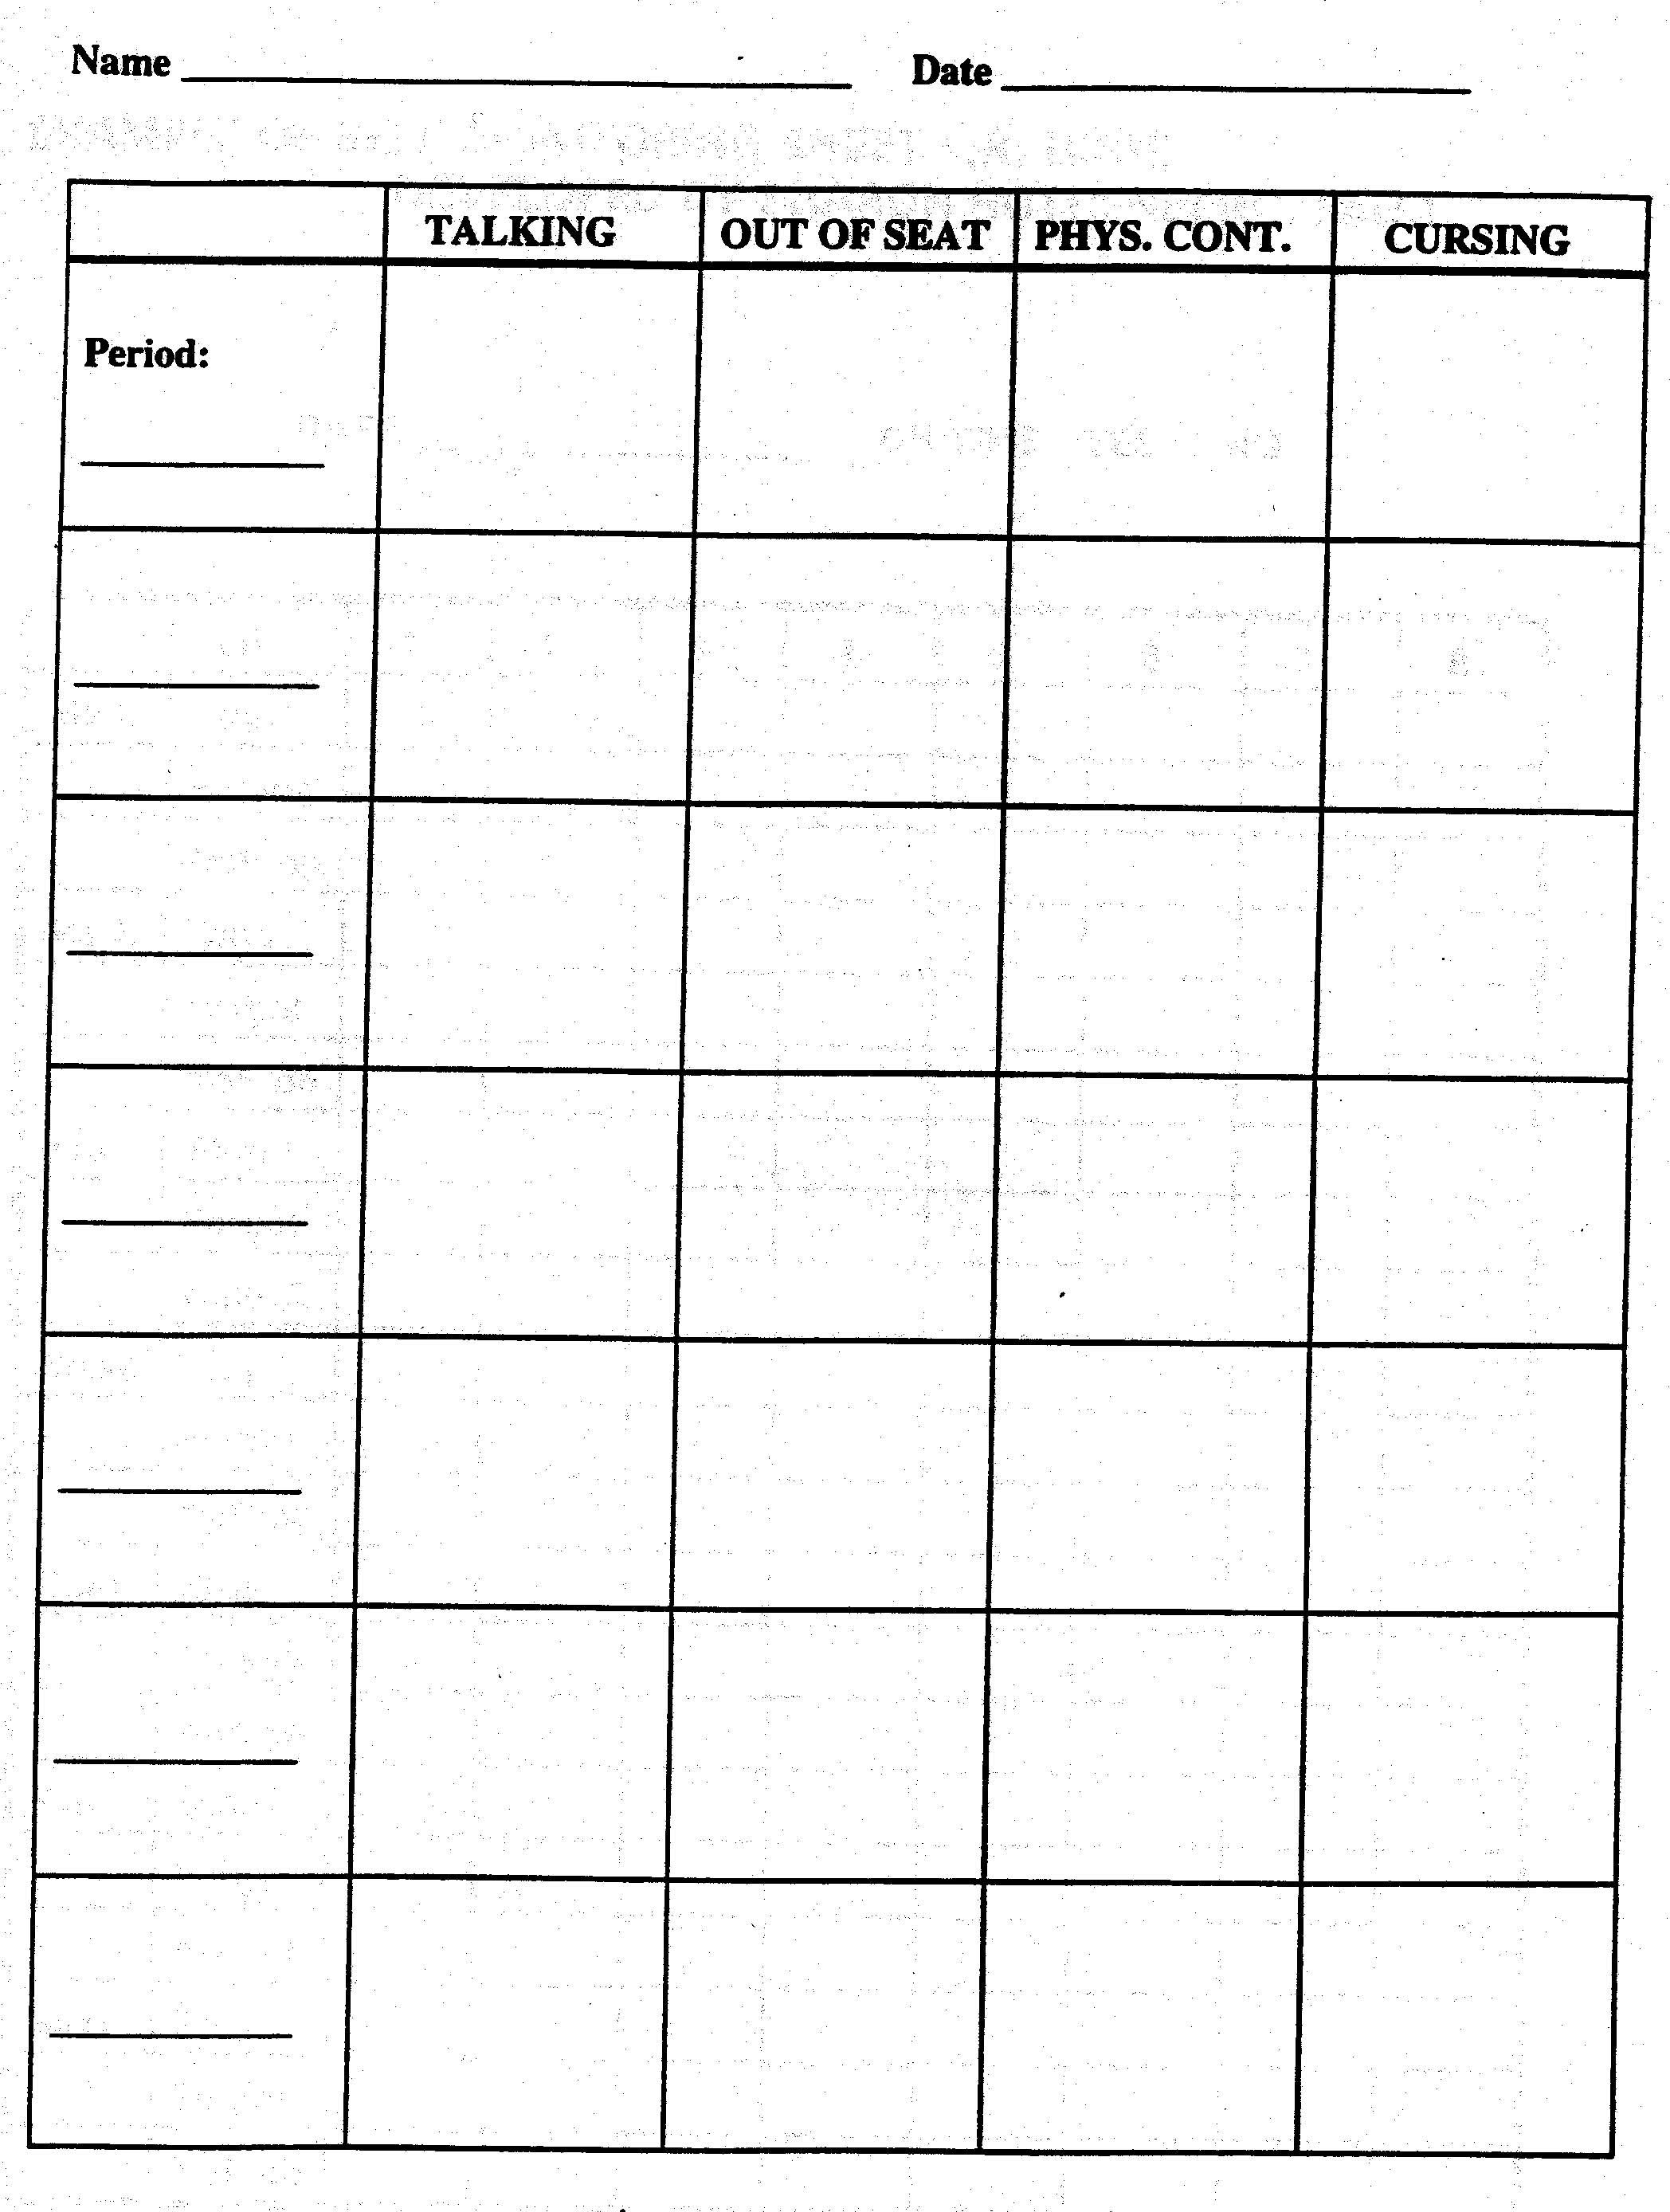 Behavior Frequency Data Sheet Printable